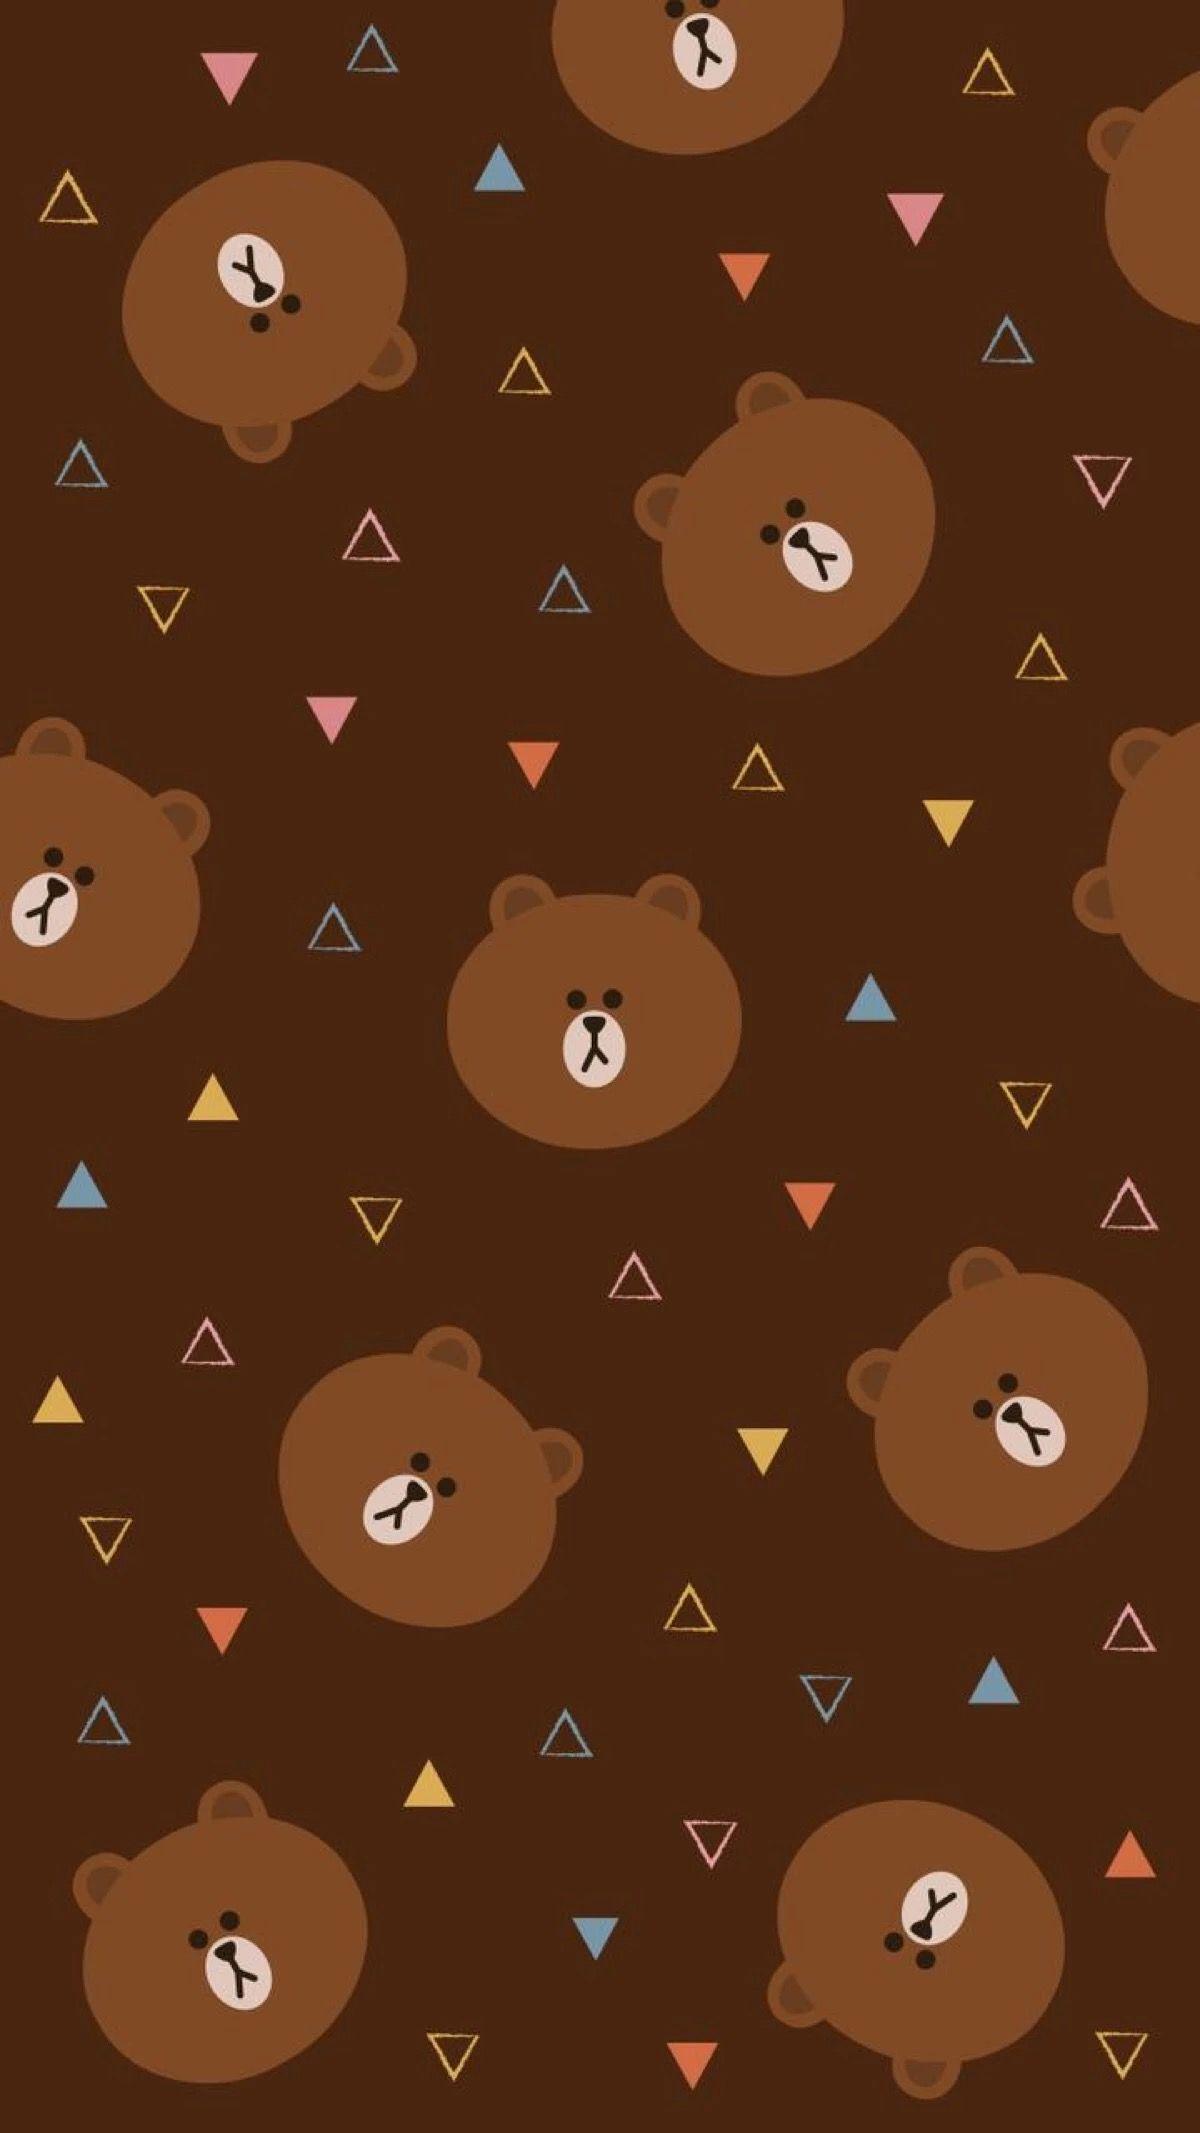 Cute Wallpaper Latar Belakang Animasi Beruang Coklat